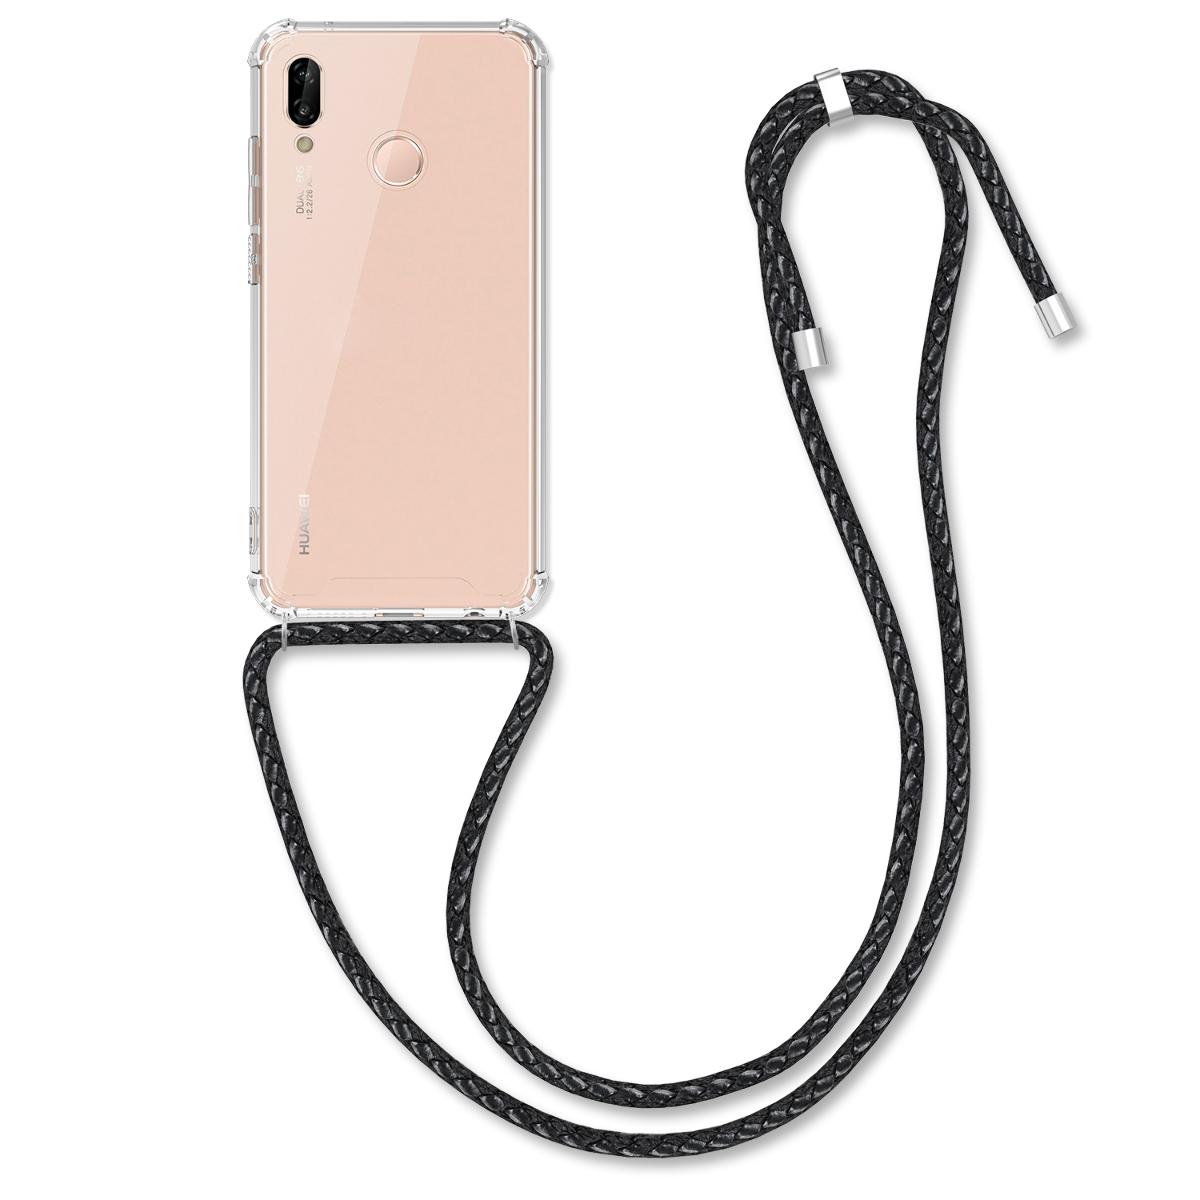 KW Θήκη Σιλικόνης με Λουράκι Λαιμού Huawei P20 Lite - Clear (50741.01)